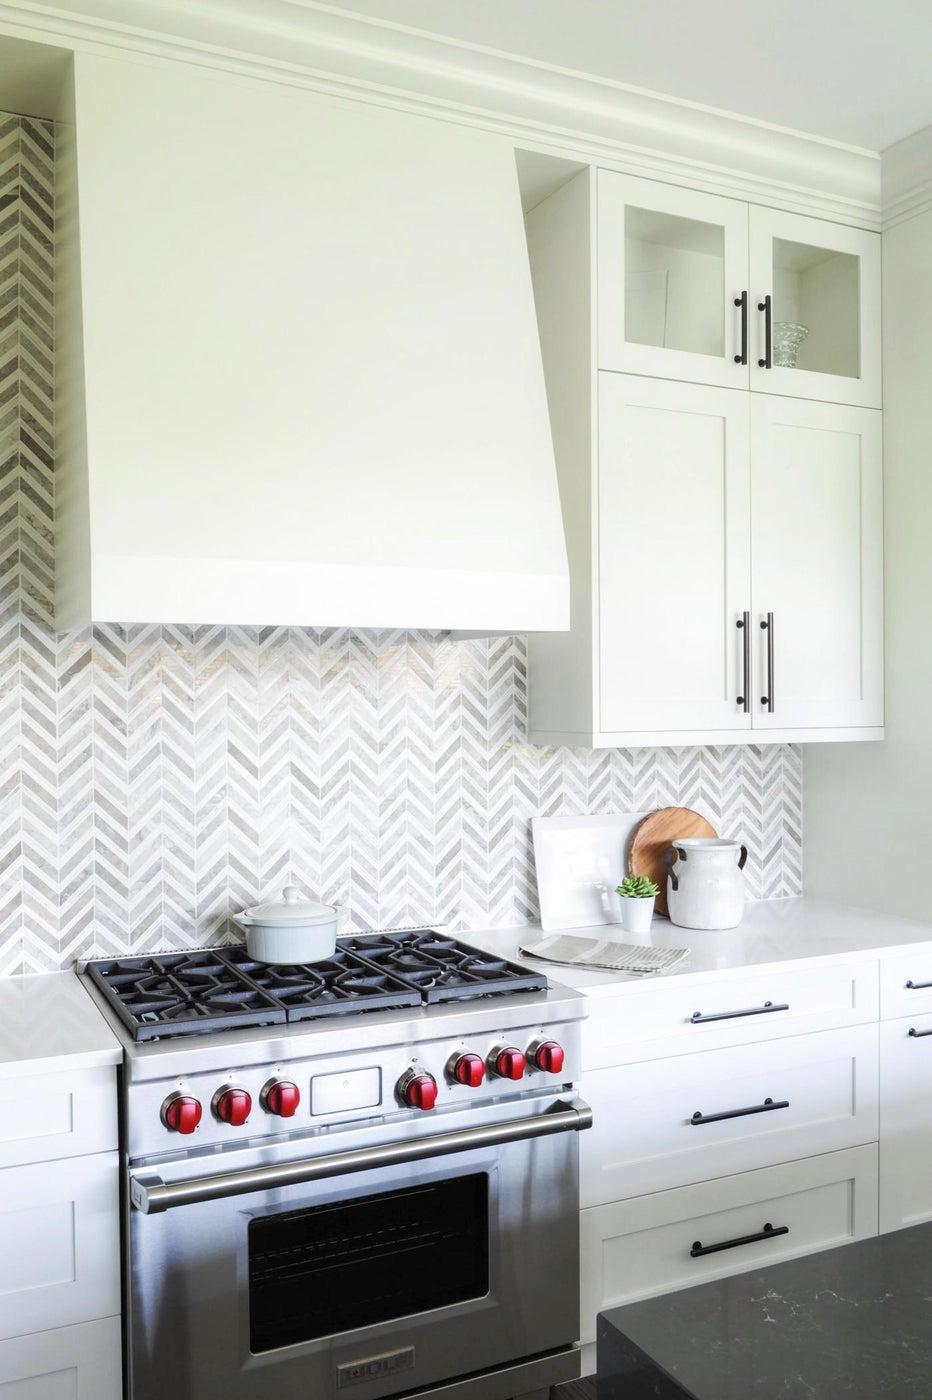 Modern kitchen with herringbone backsplash